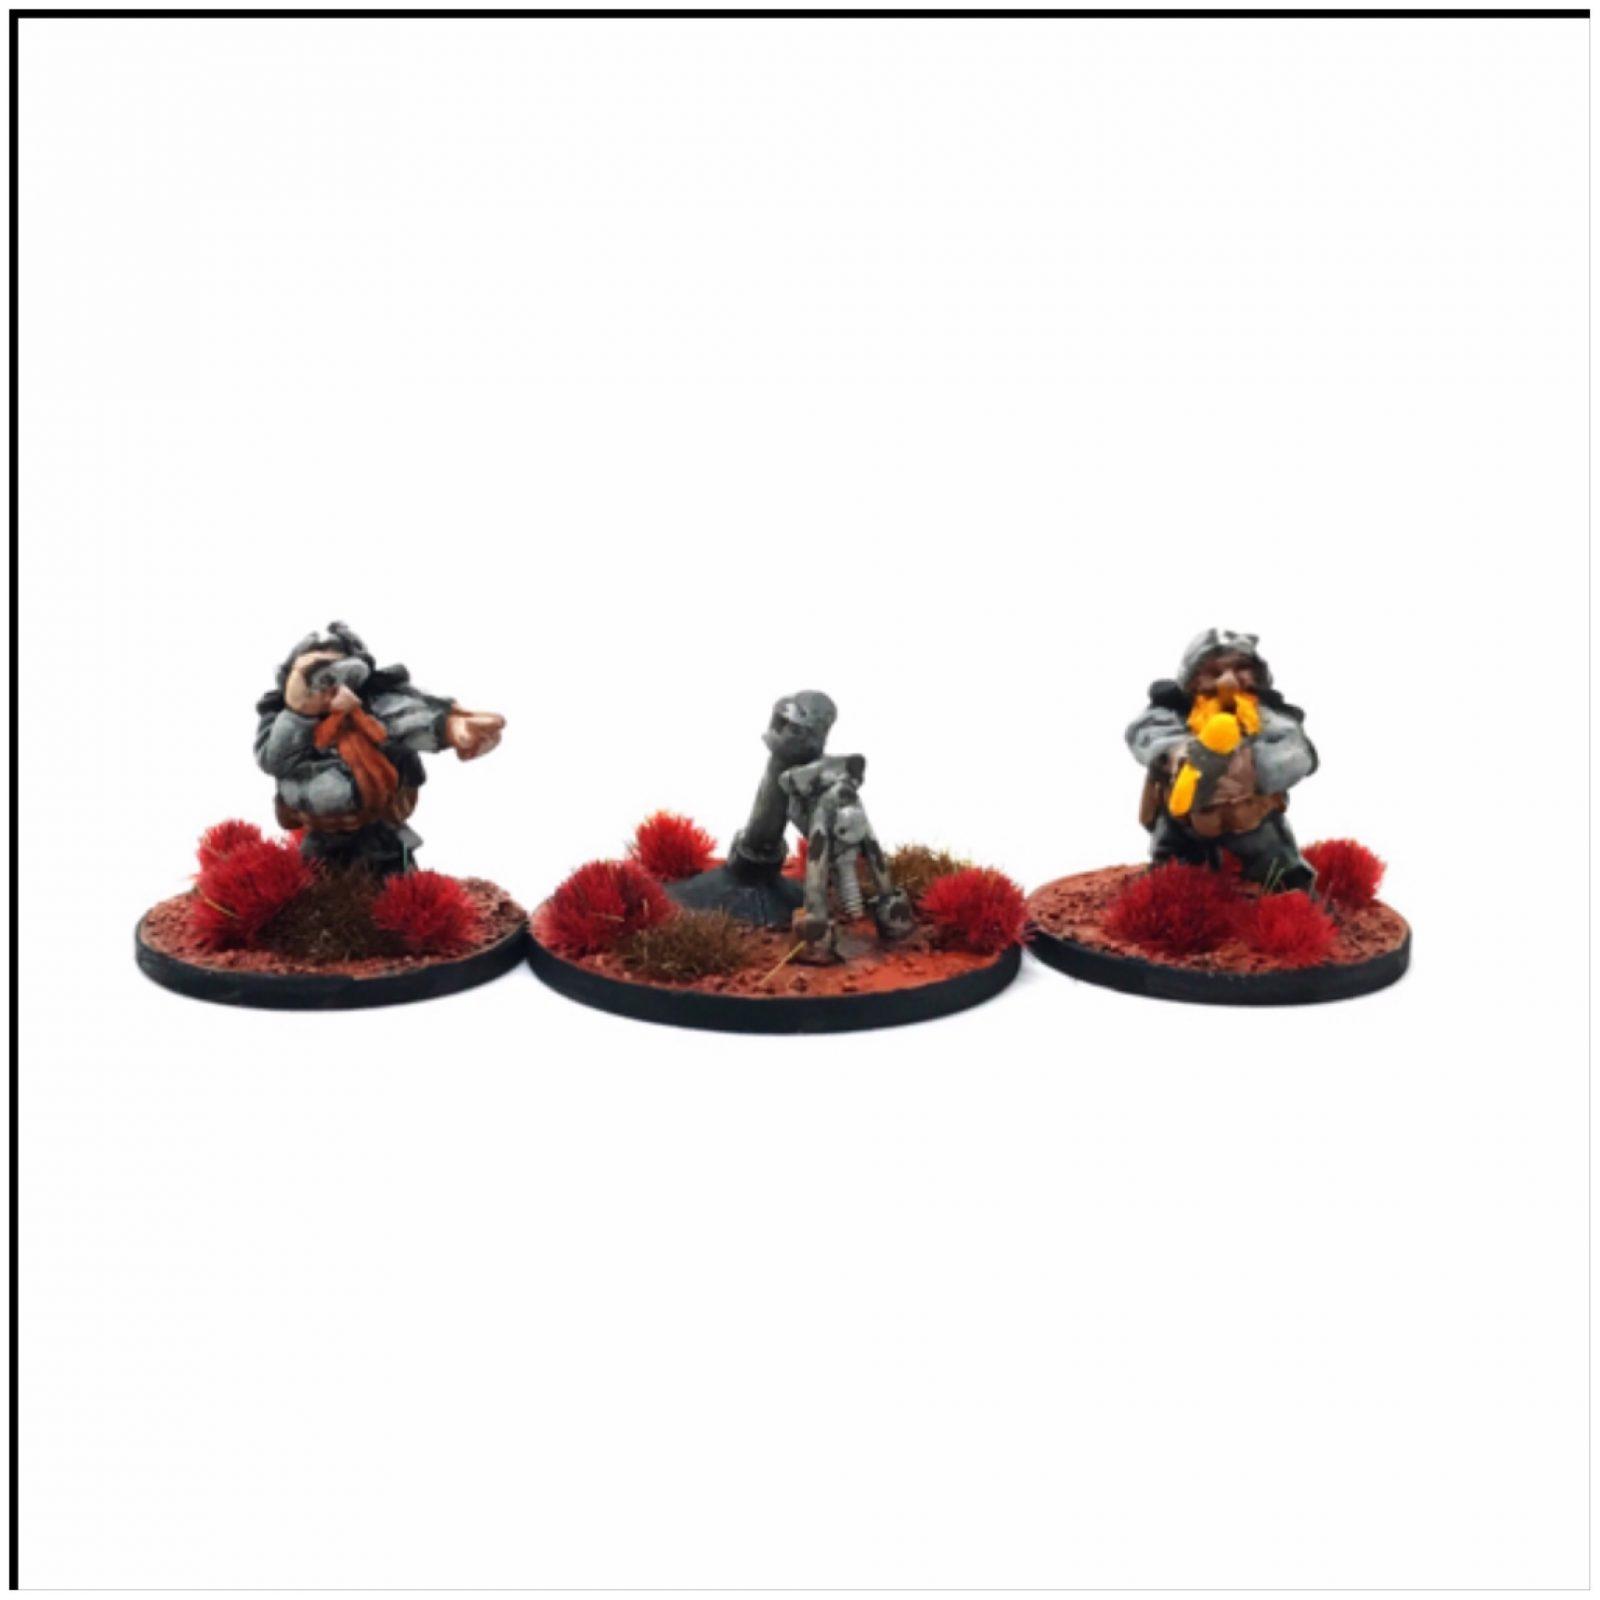 Dwarf Hearthguard – Mortar Team